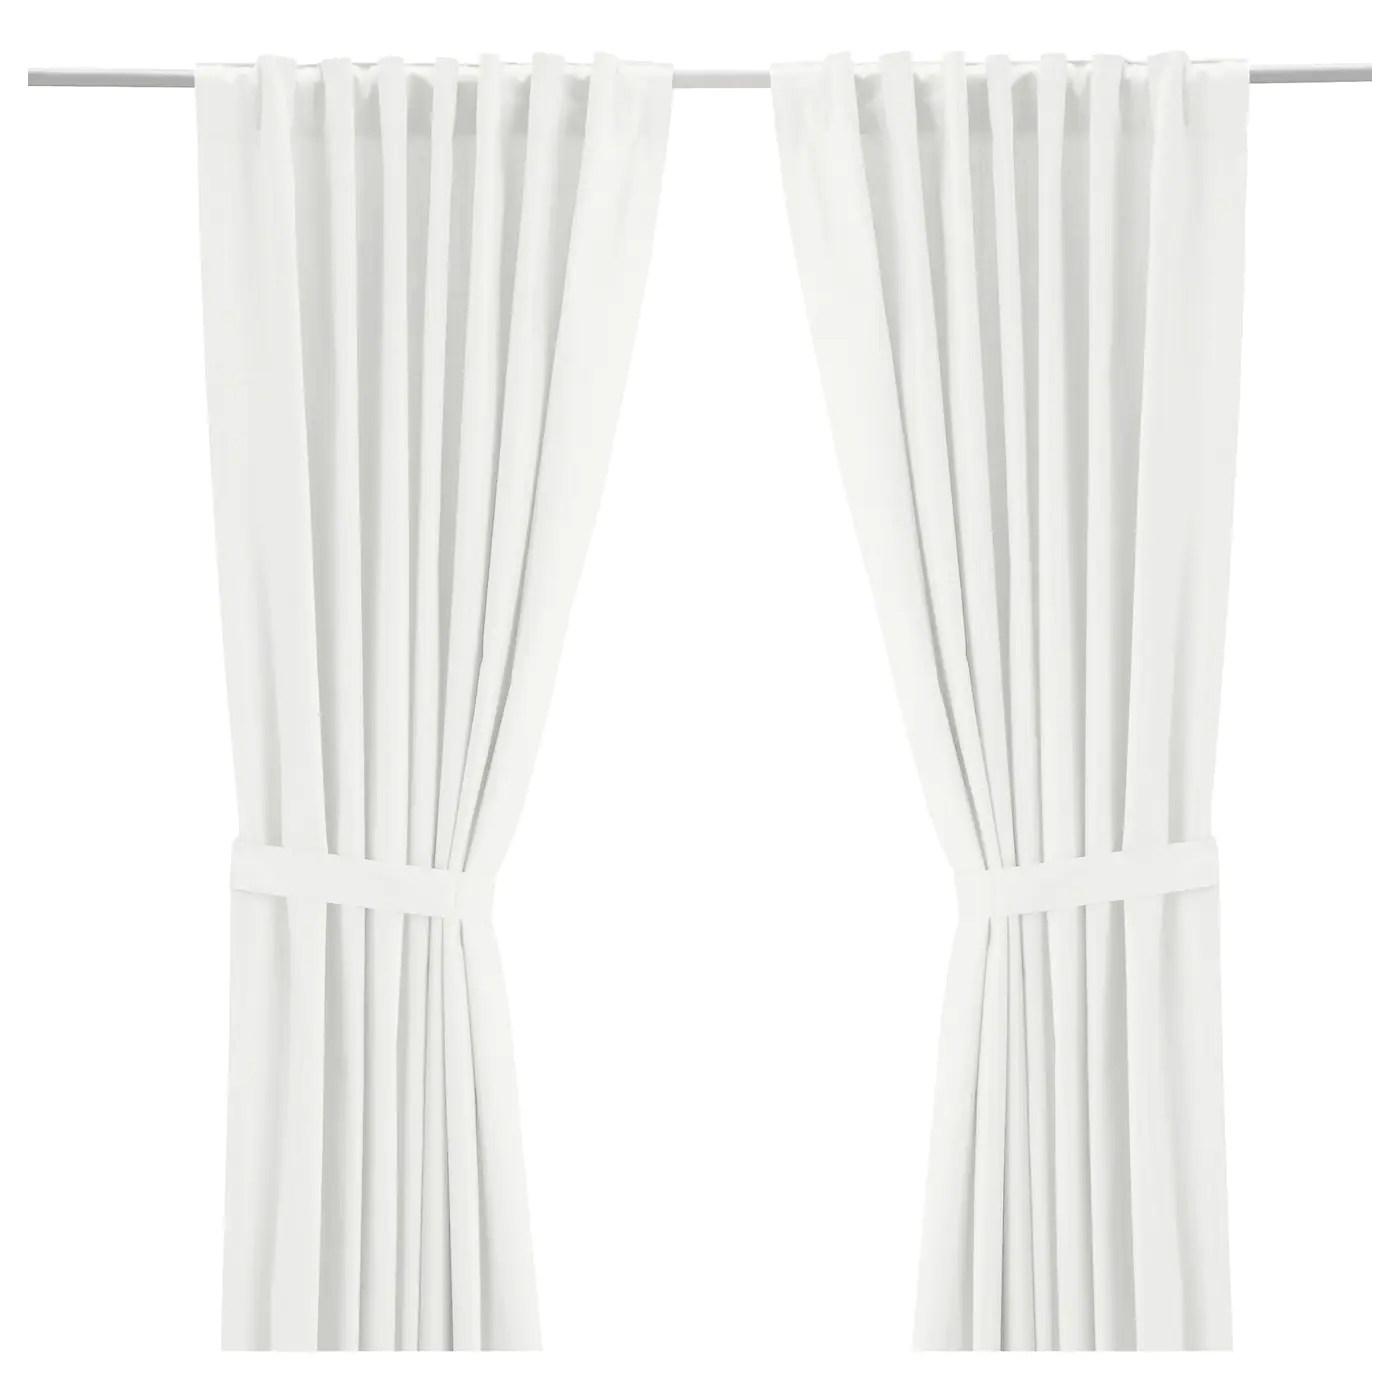 ritva curtains with tie backs 1 pair white 57x98